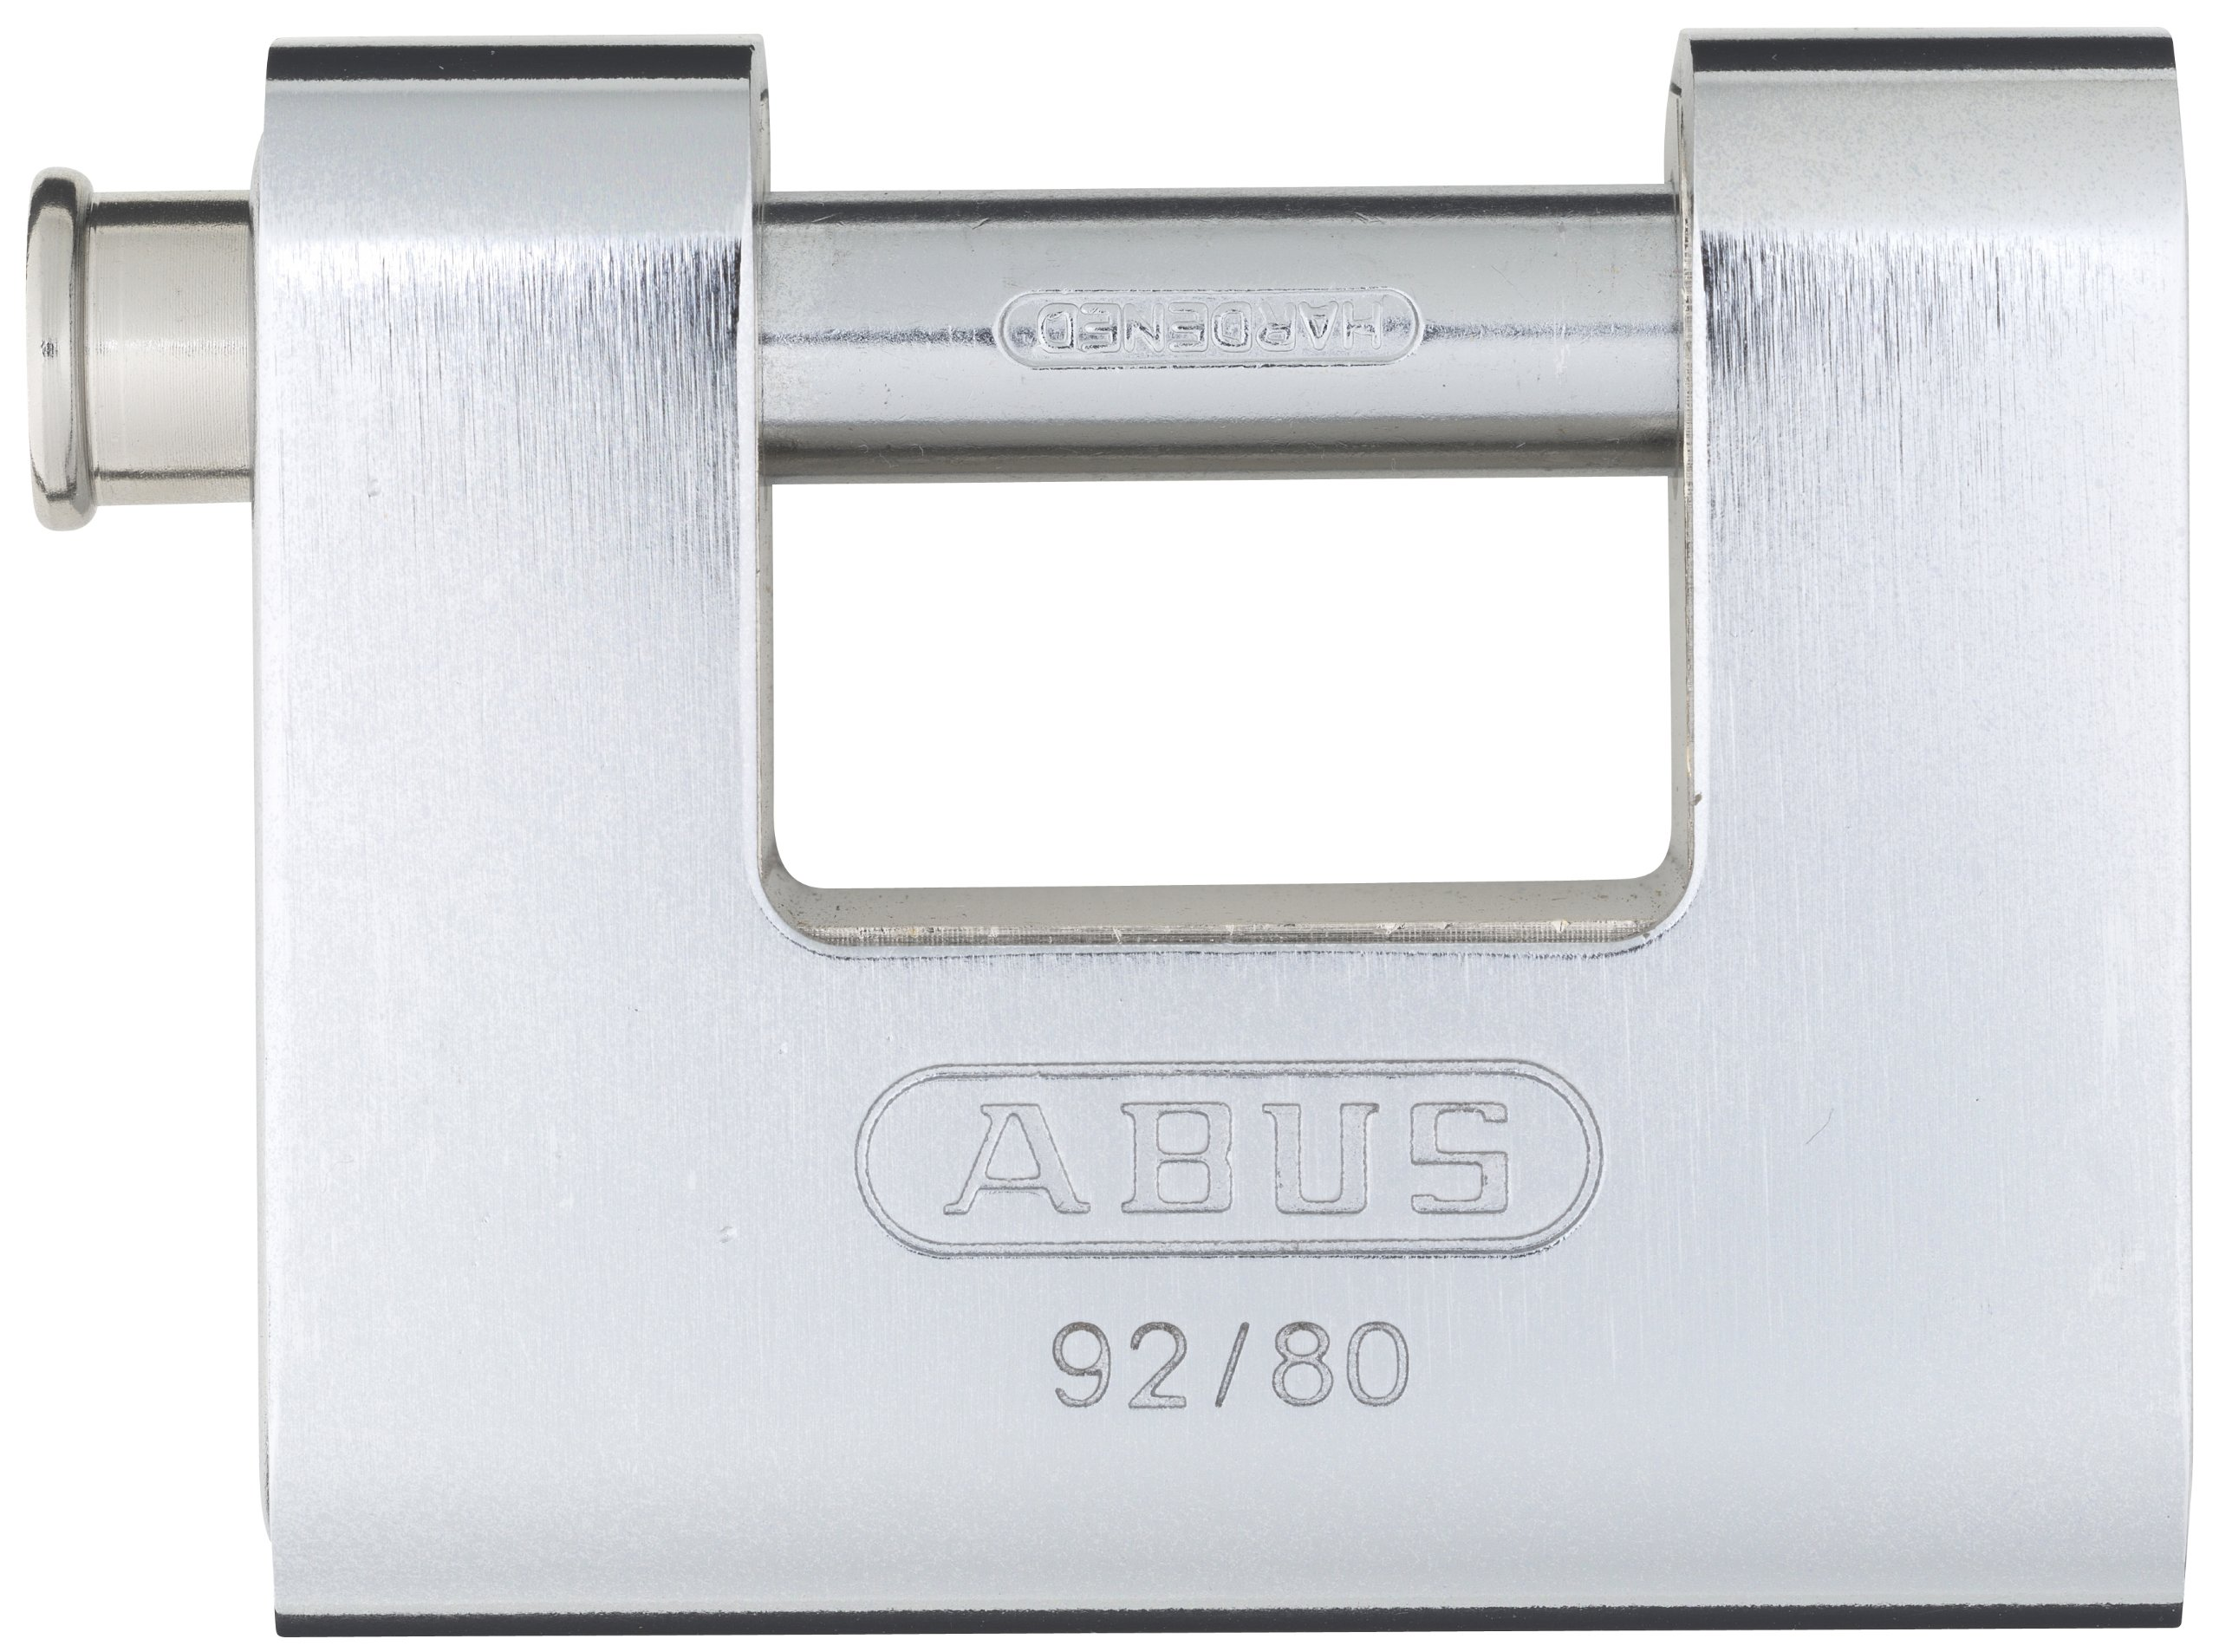 ABUS 92/80 Monoblock Solid Brass with Steel Jacket Padlock Keyed Alike